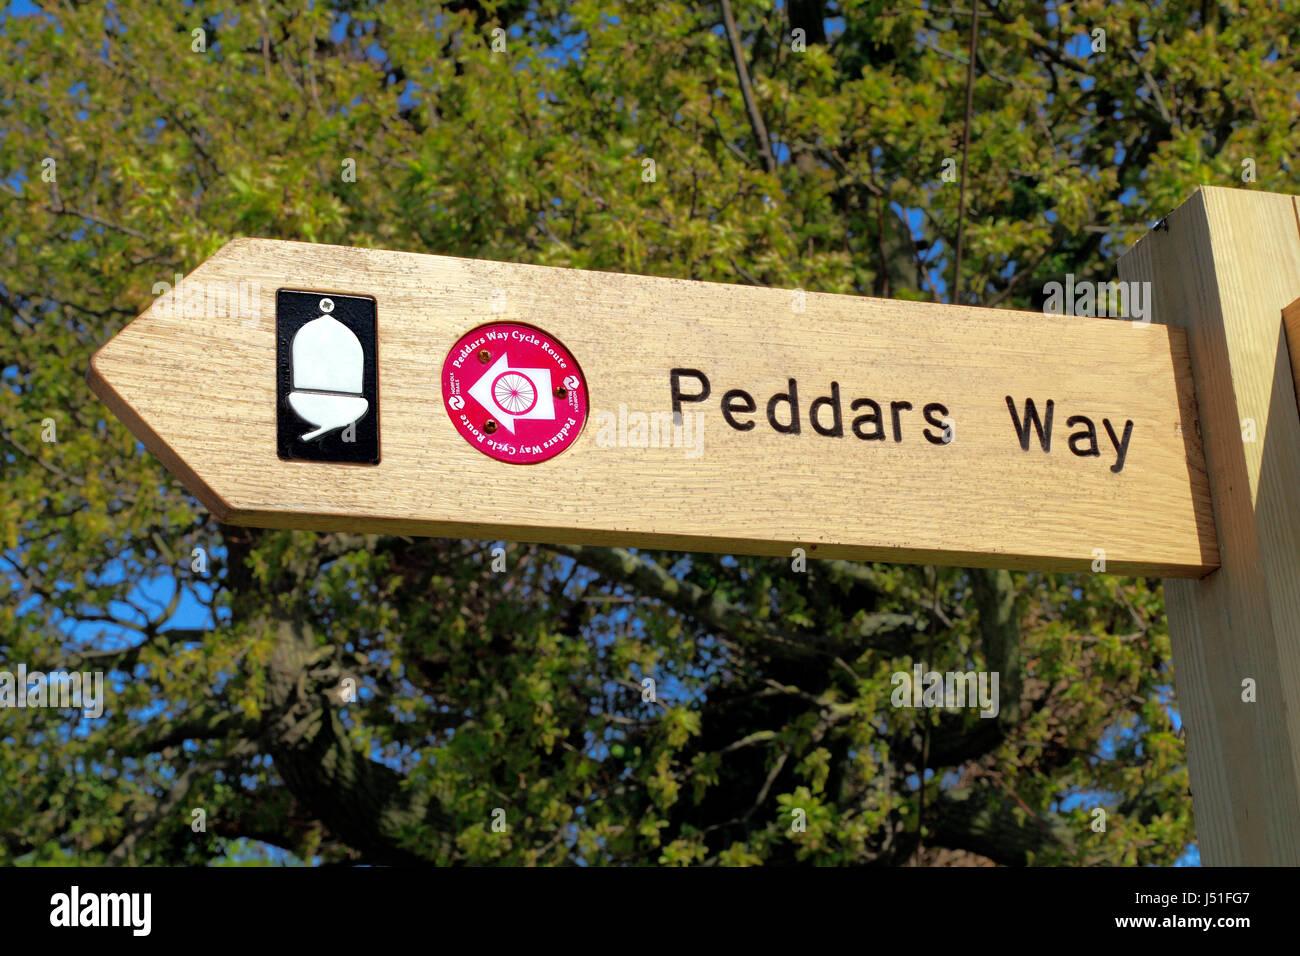 Peddars Way, sentier, doigt post, signer, Acorn Trust, randonnée à vélo, Ringstead, Norfolk, England, Photo Stock